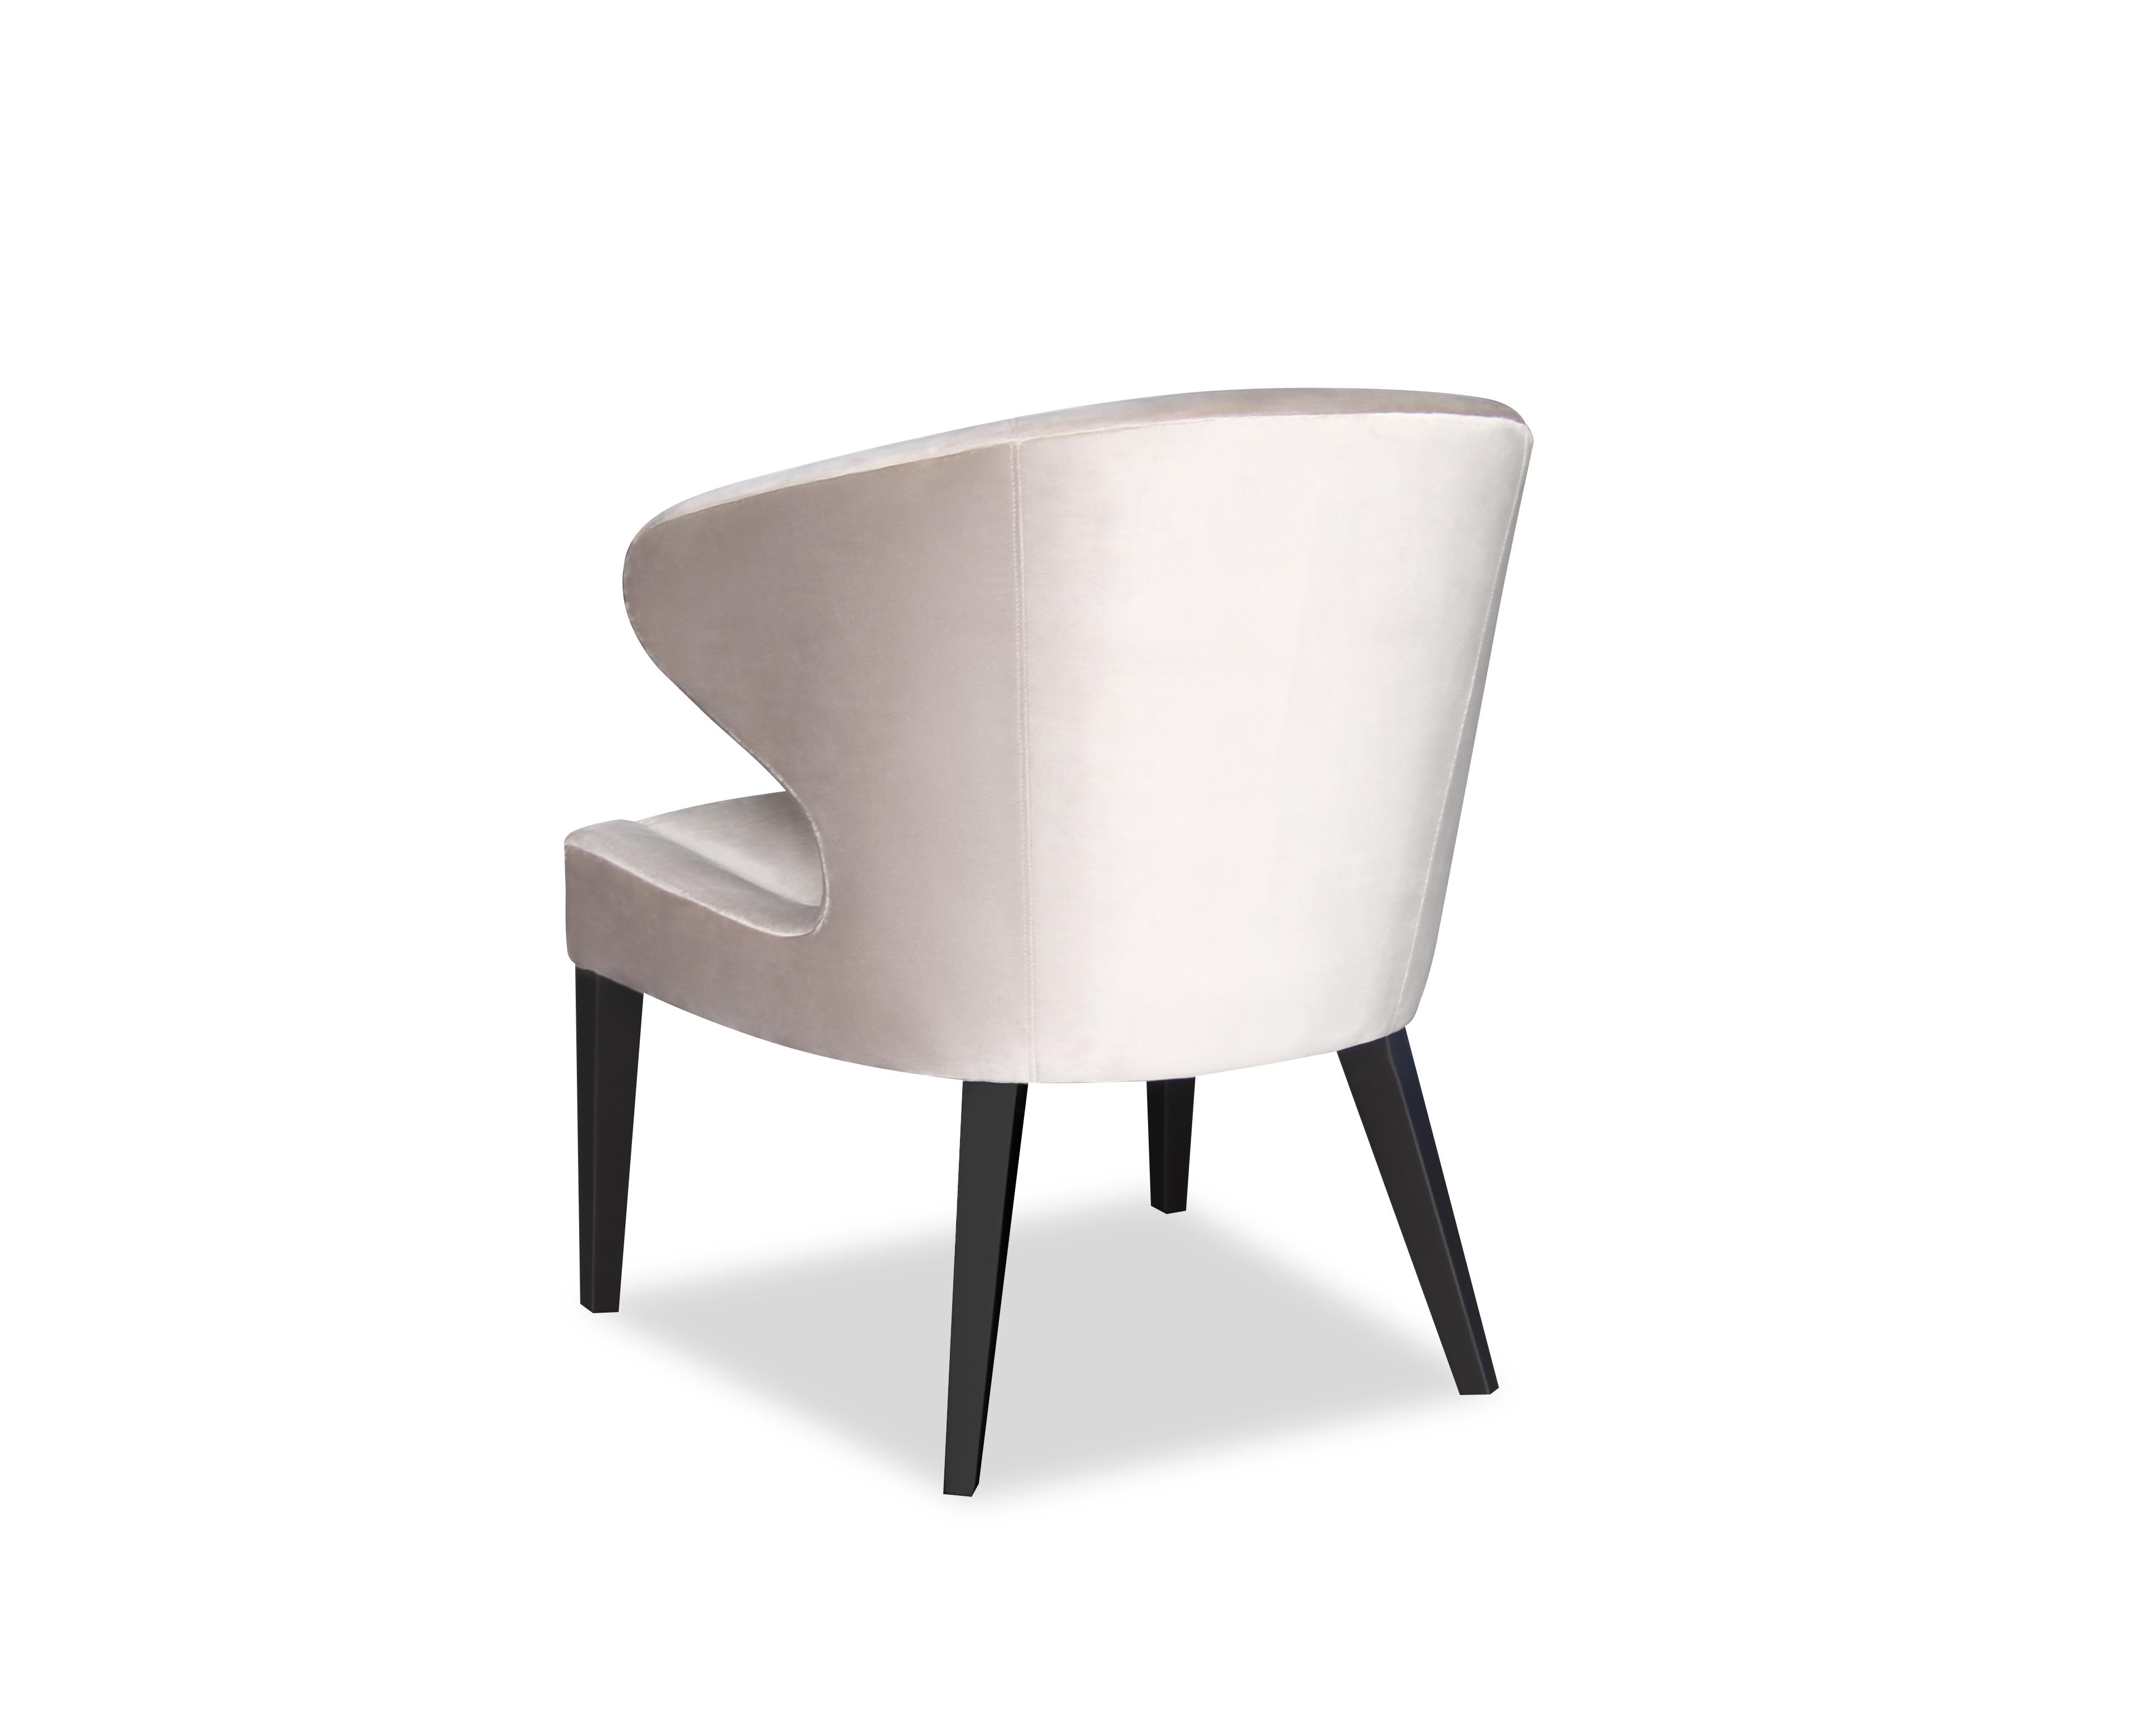 Liang & Eimil Taylor Occasional Chair Ives Mink Velvet OD-OCH-007 (4)